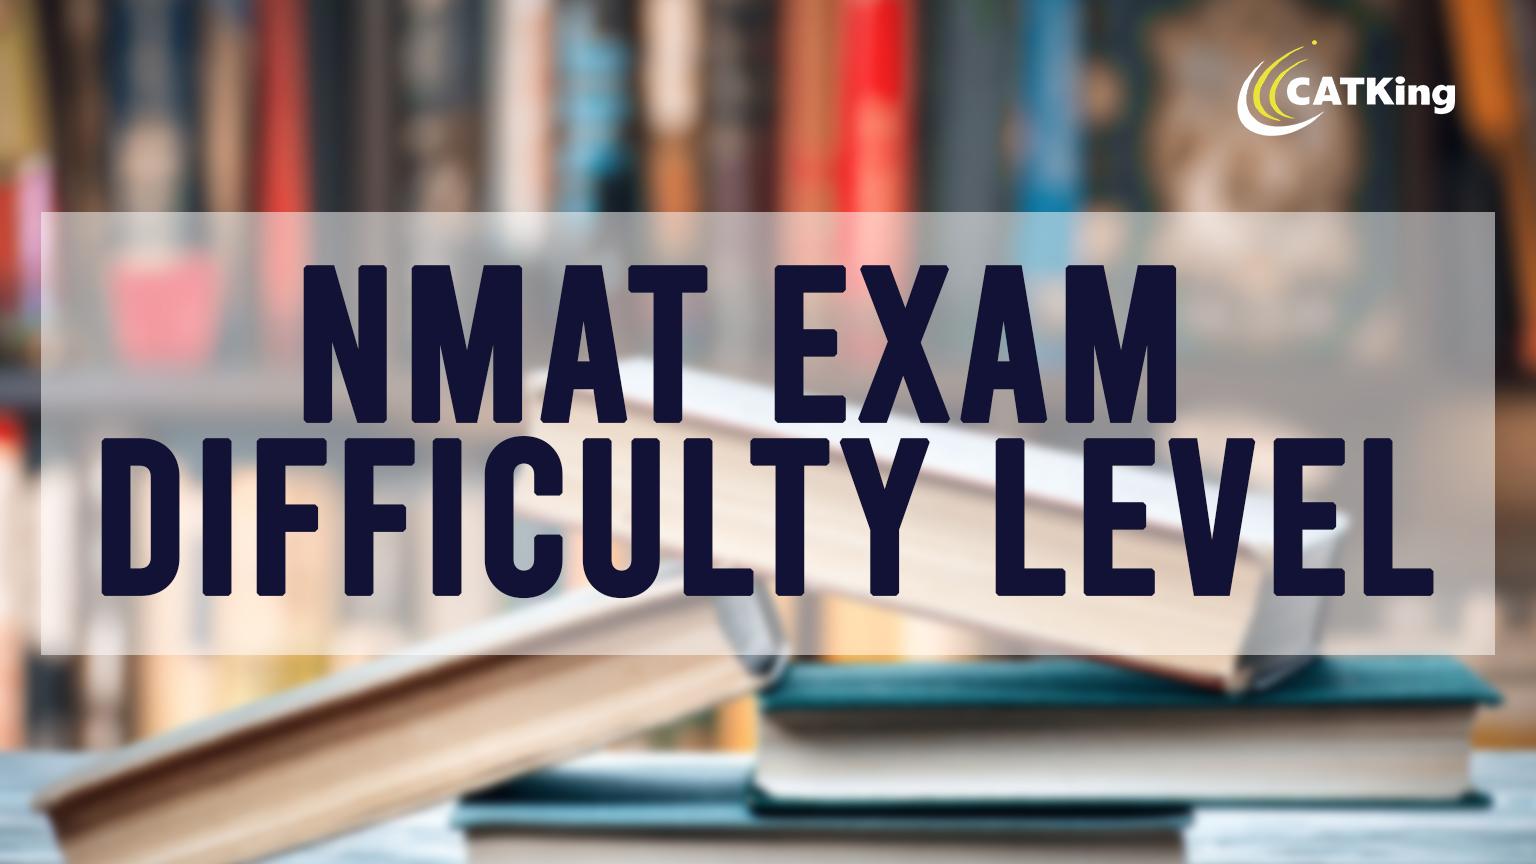 nmat exam difficulty level